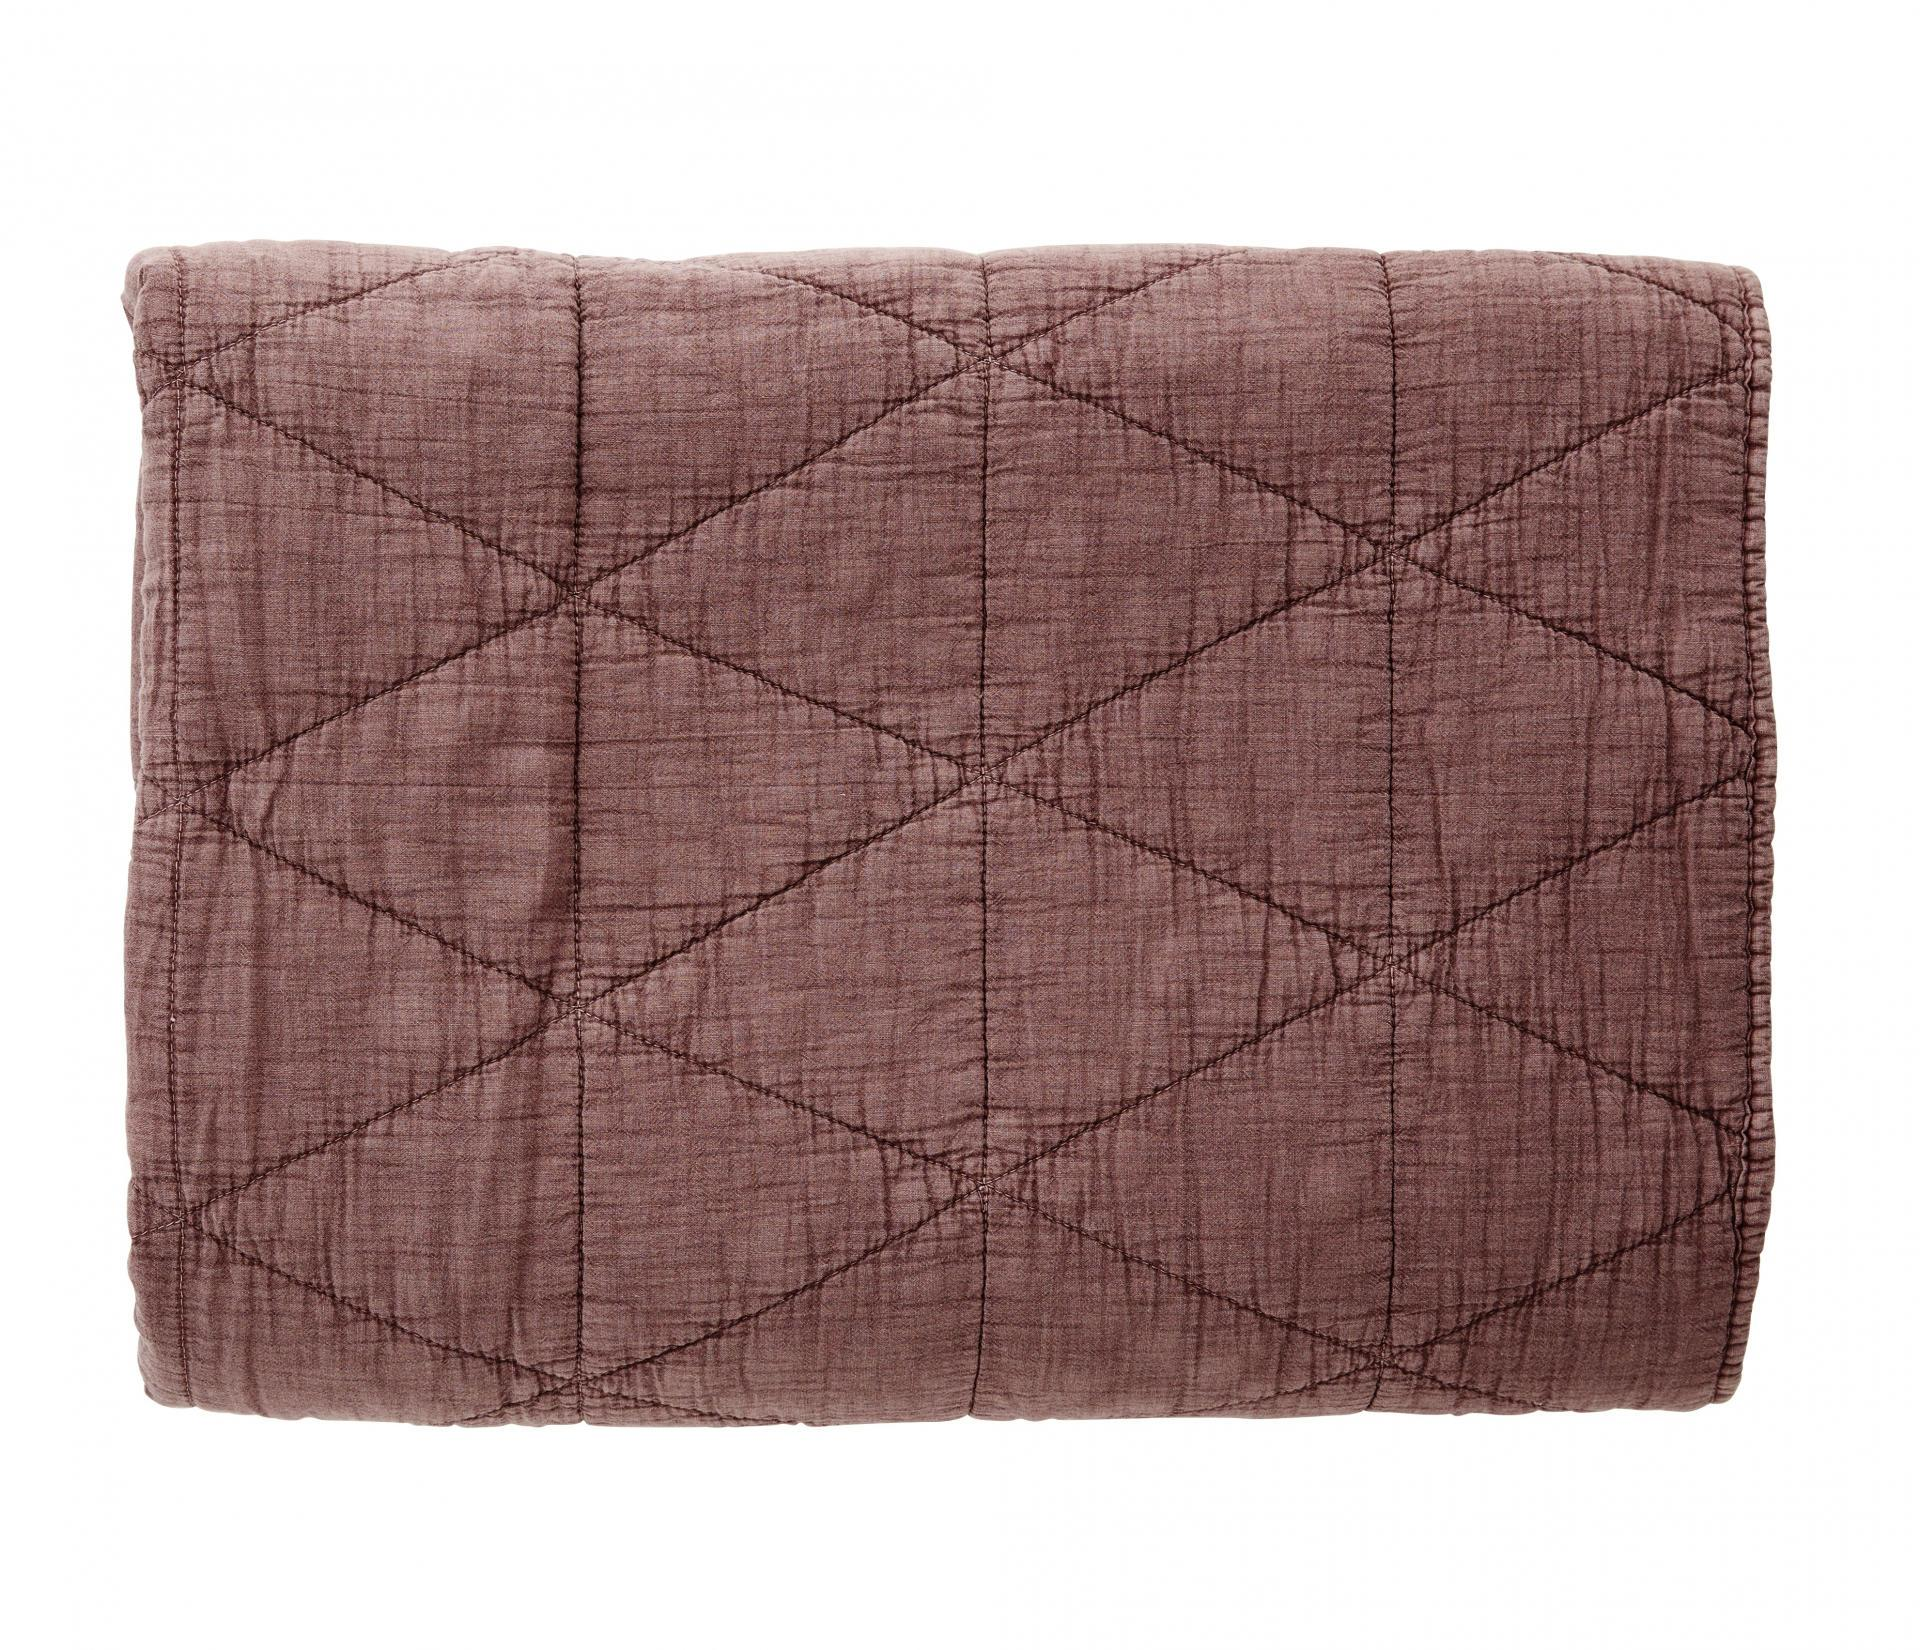 Madam Stoltz Prošívaná deka Dusty rose 140x200 cm, růžová barva, textil